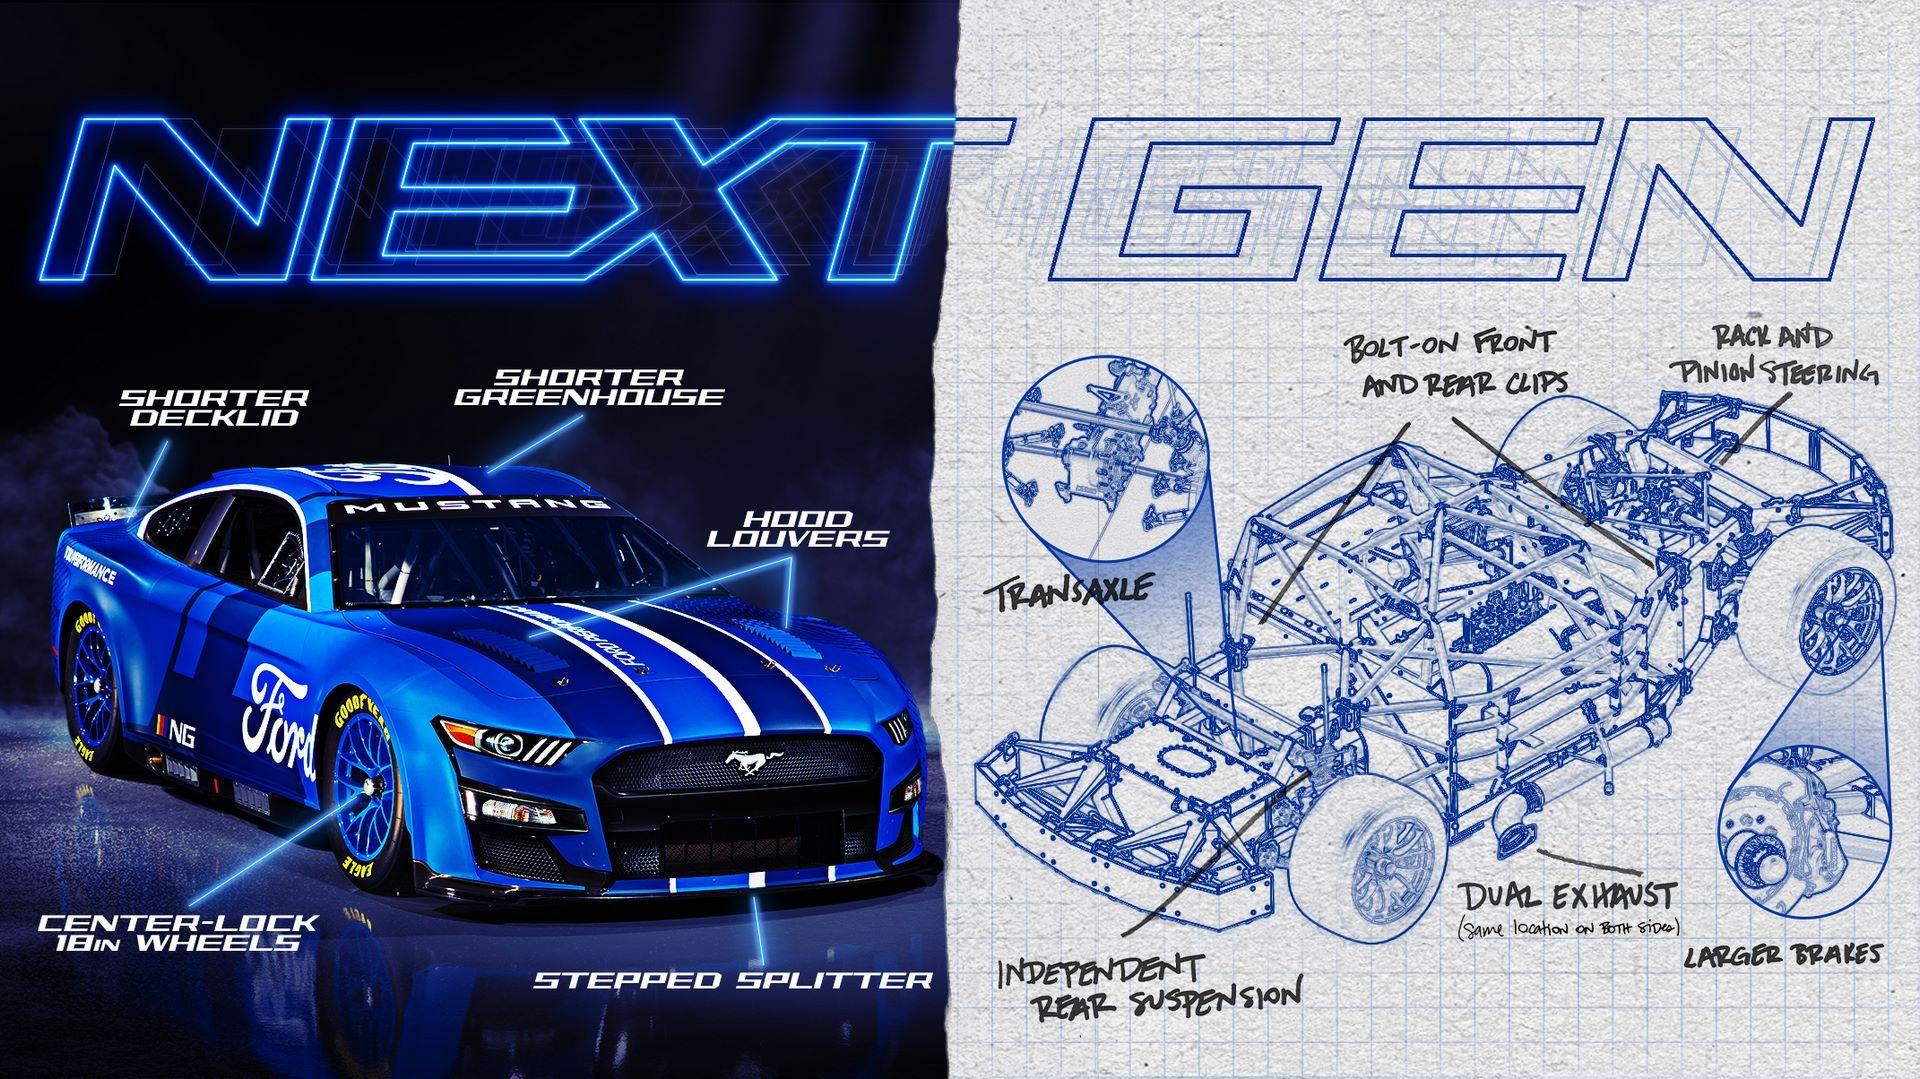 Ford-Mustang-Next-Gen-Nascar-15